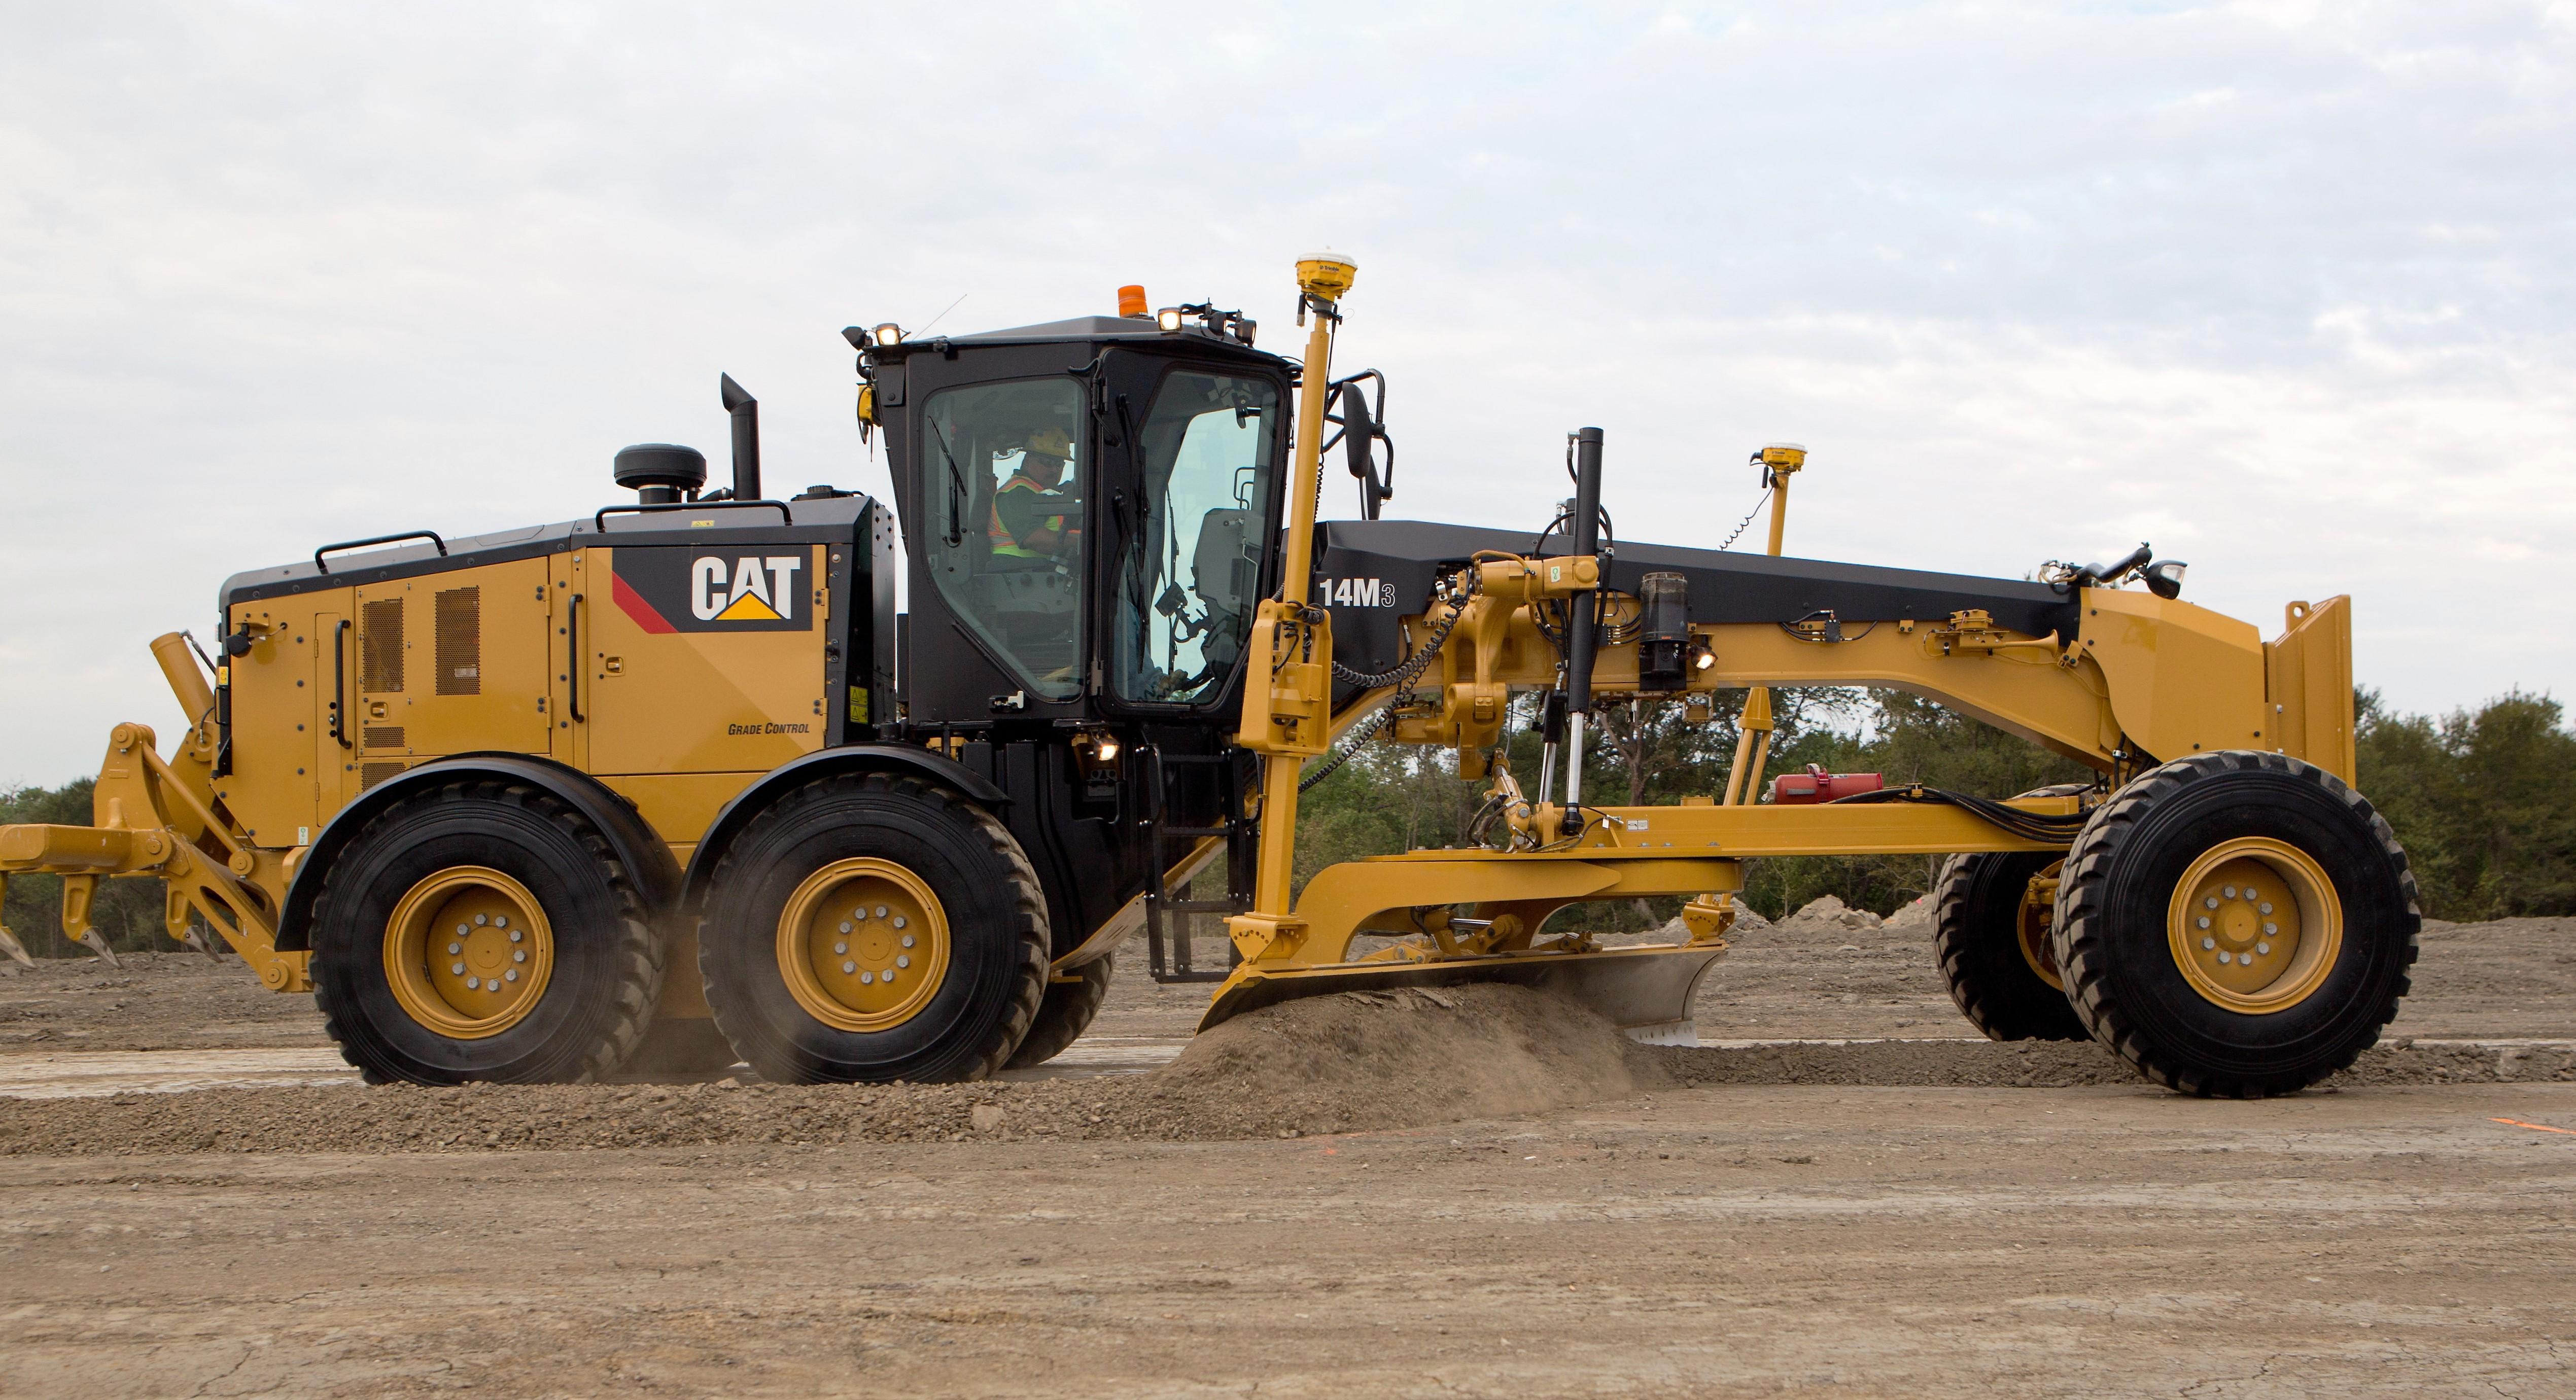 Featured Product: Caterpillar's 14M3 Motor Grader